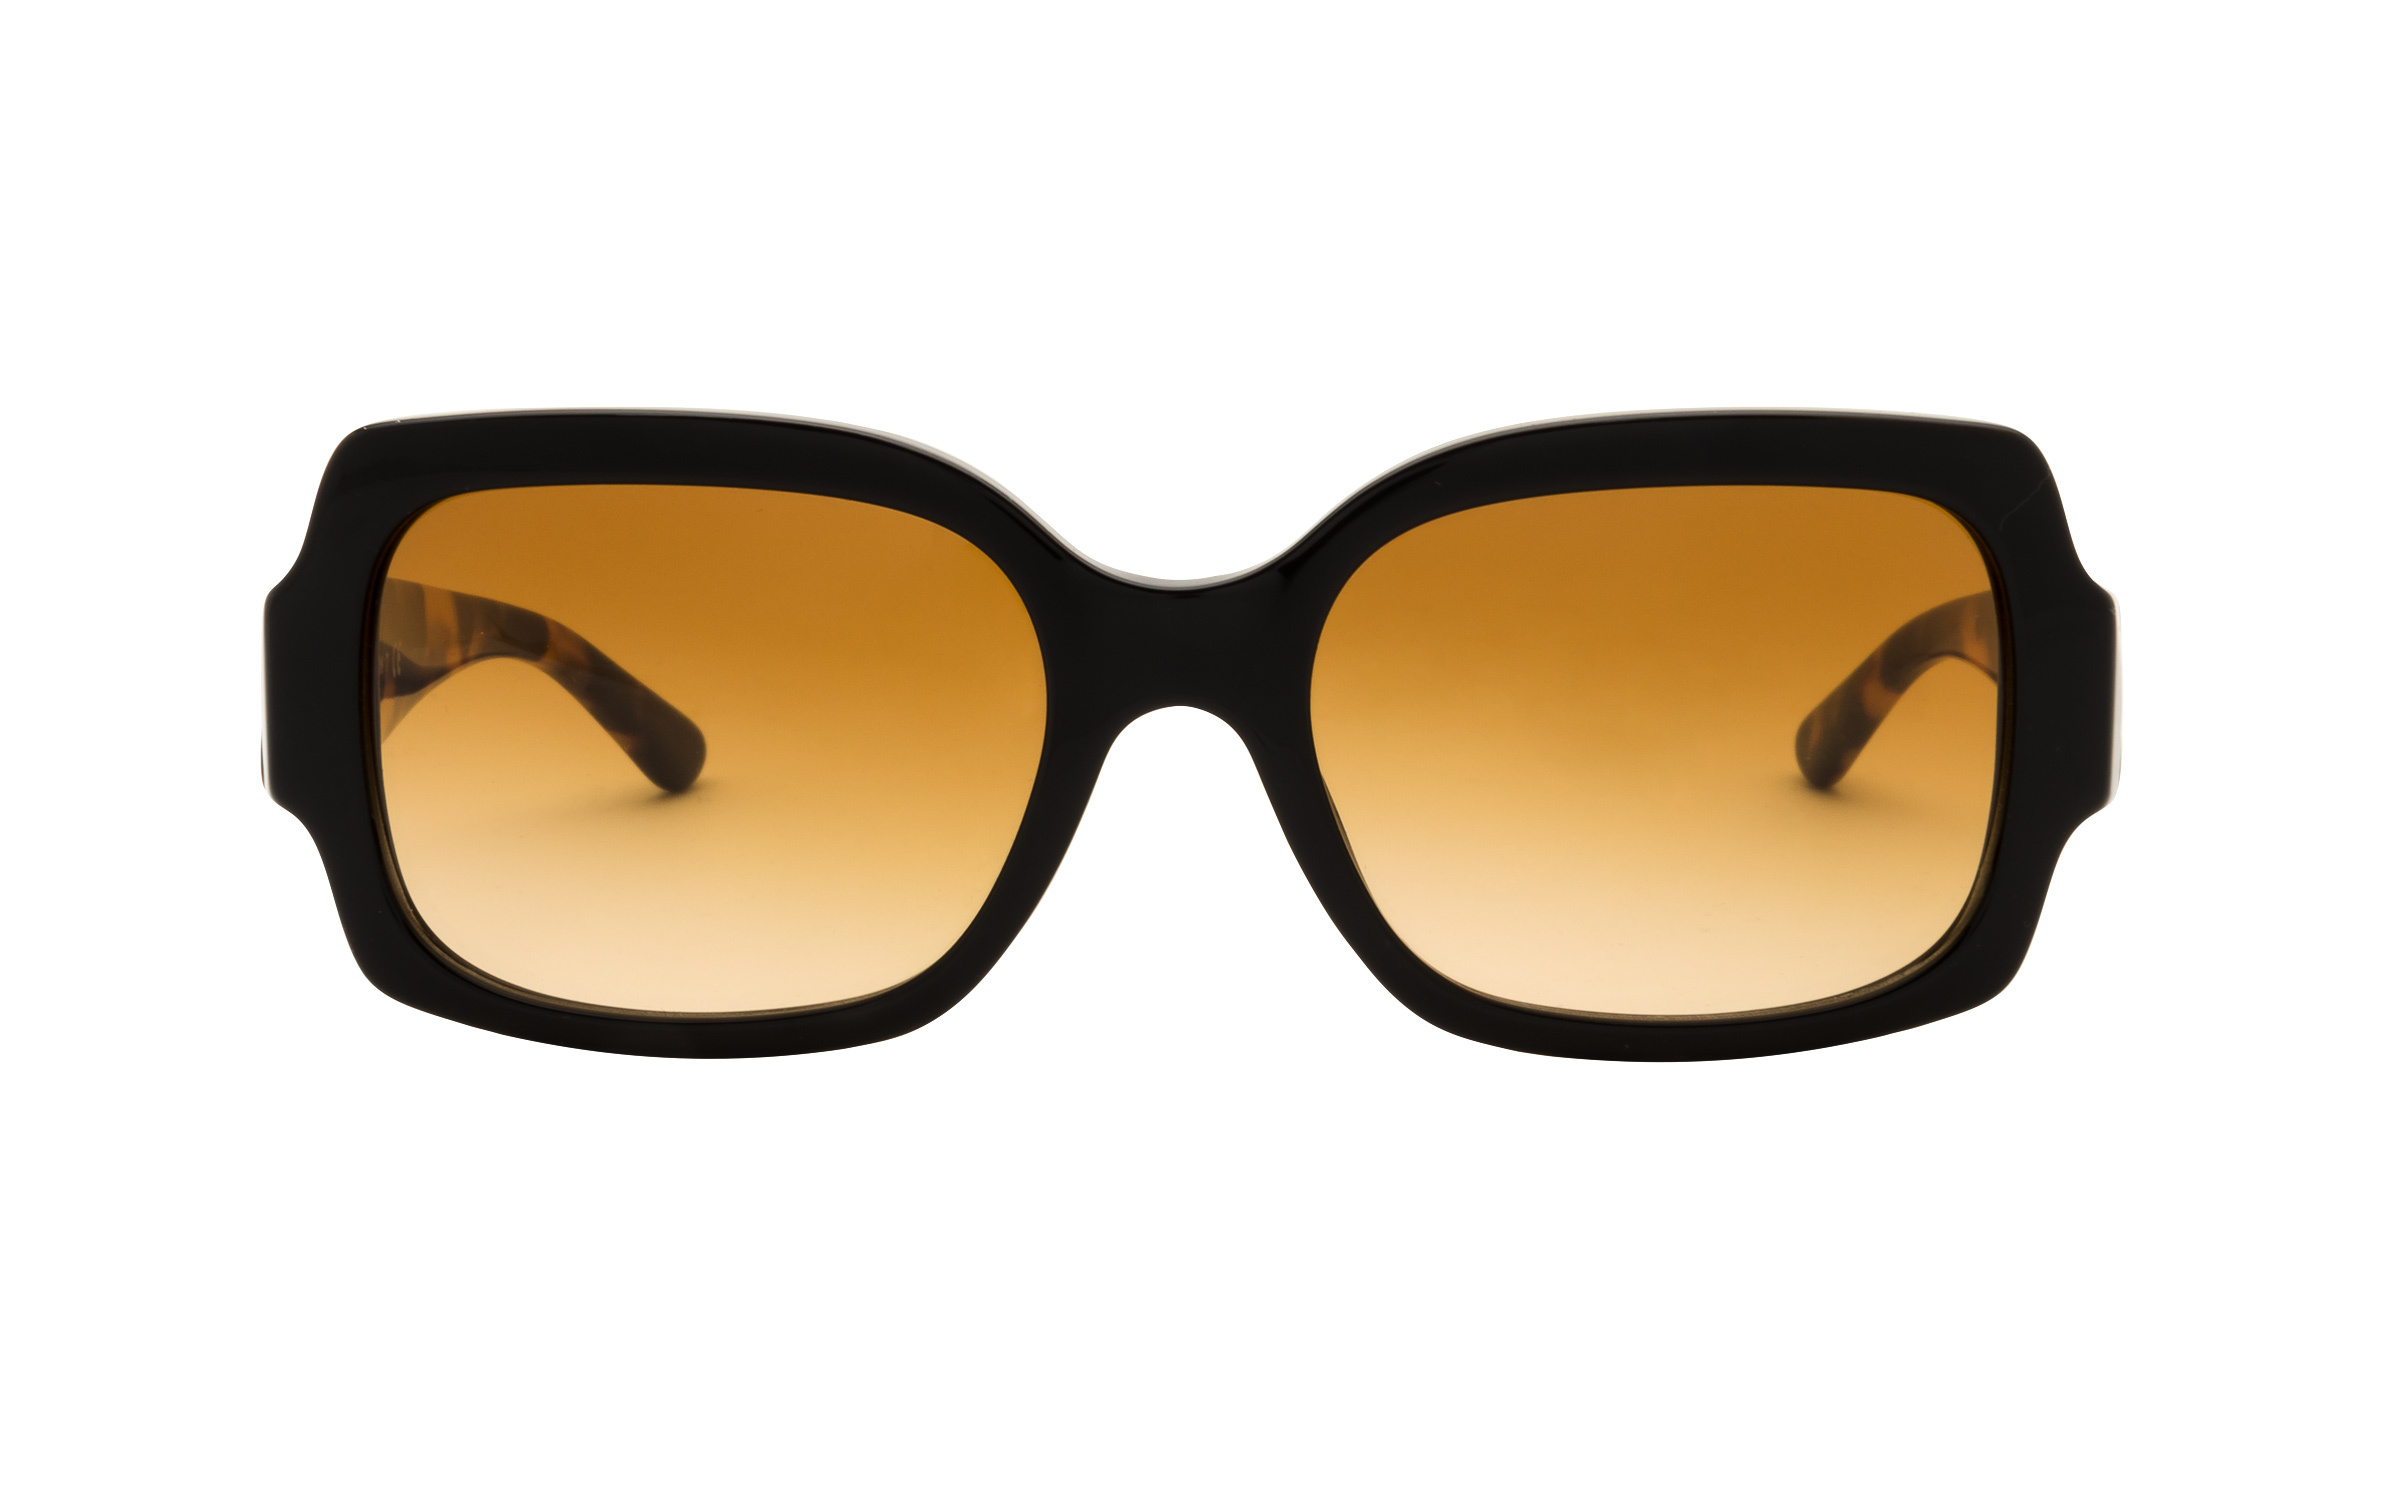 http://www.coastal.com/ - Luxottica Tory Burch TY7135 17592L 55 Sunglasses in Tortoise Black – Online Coastal